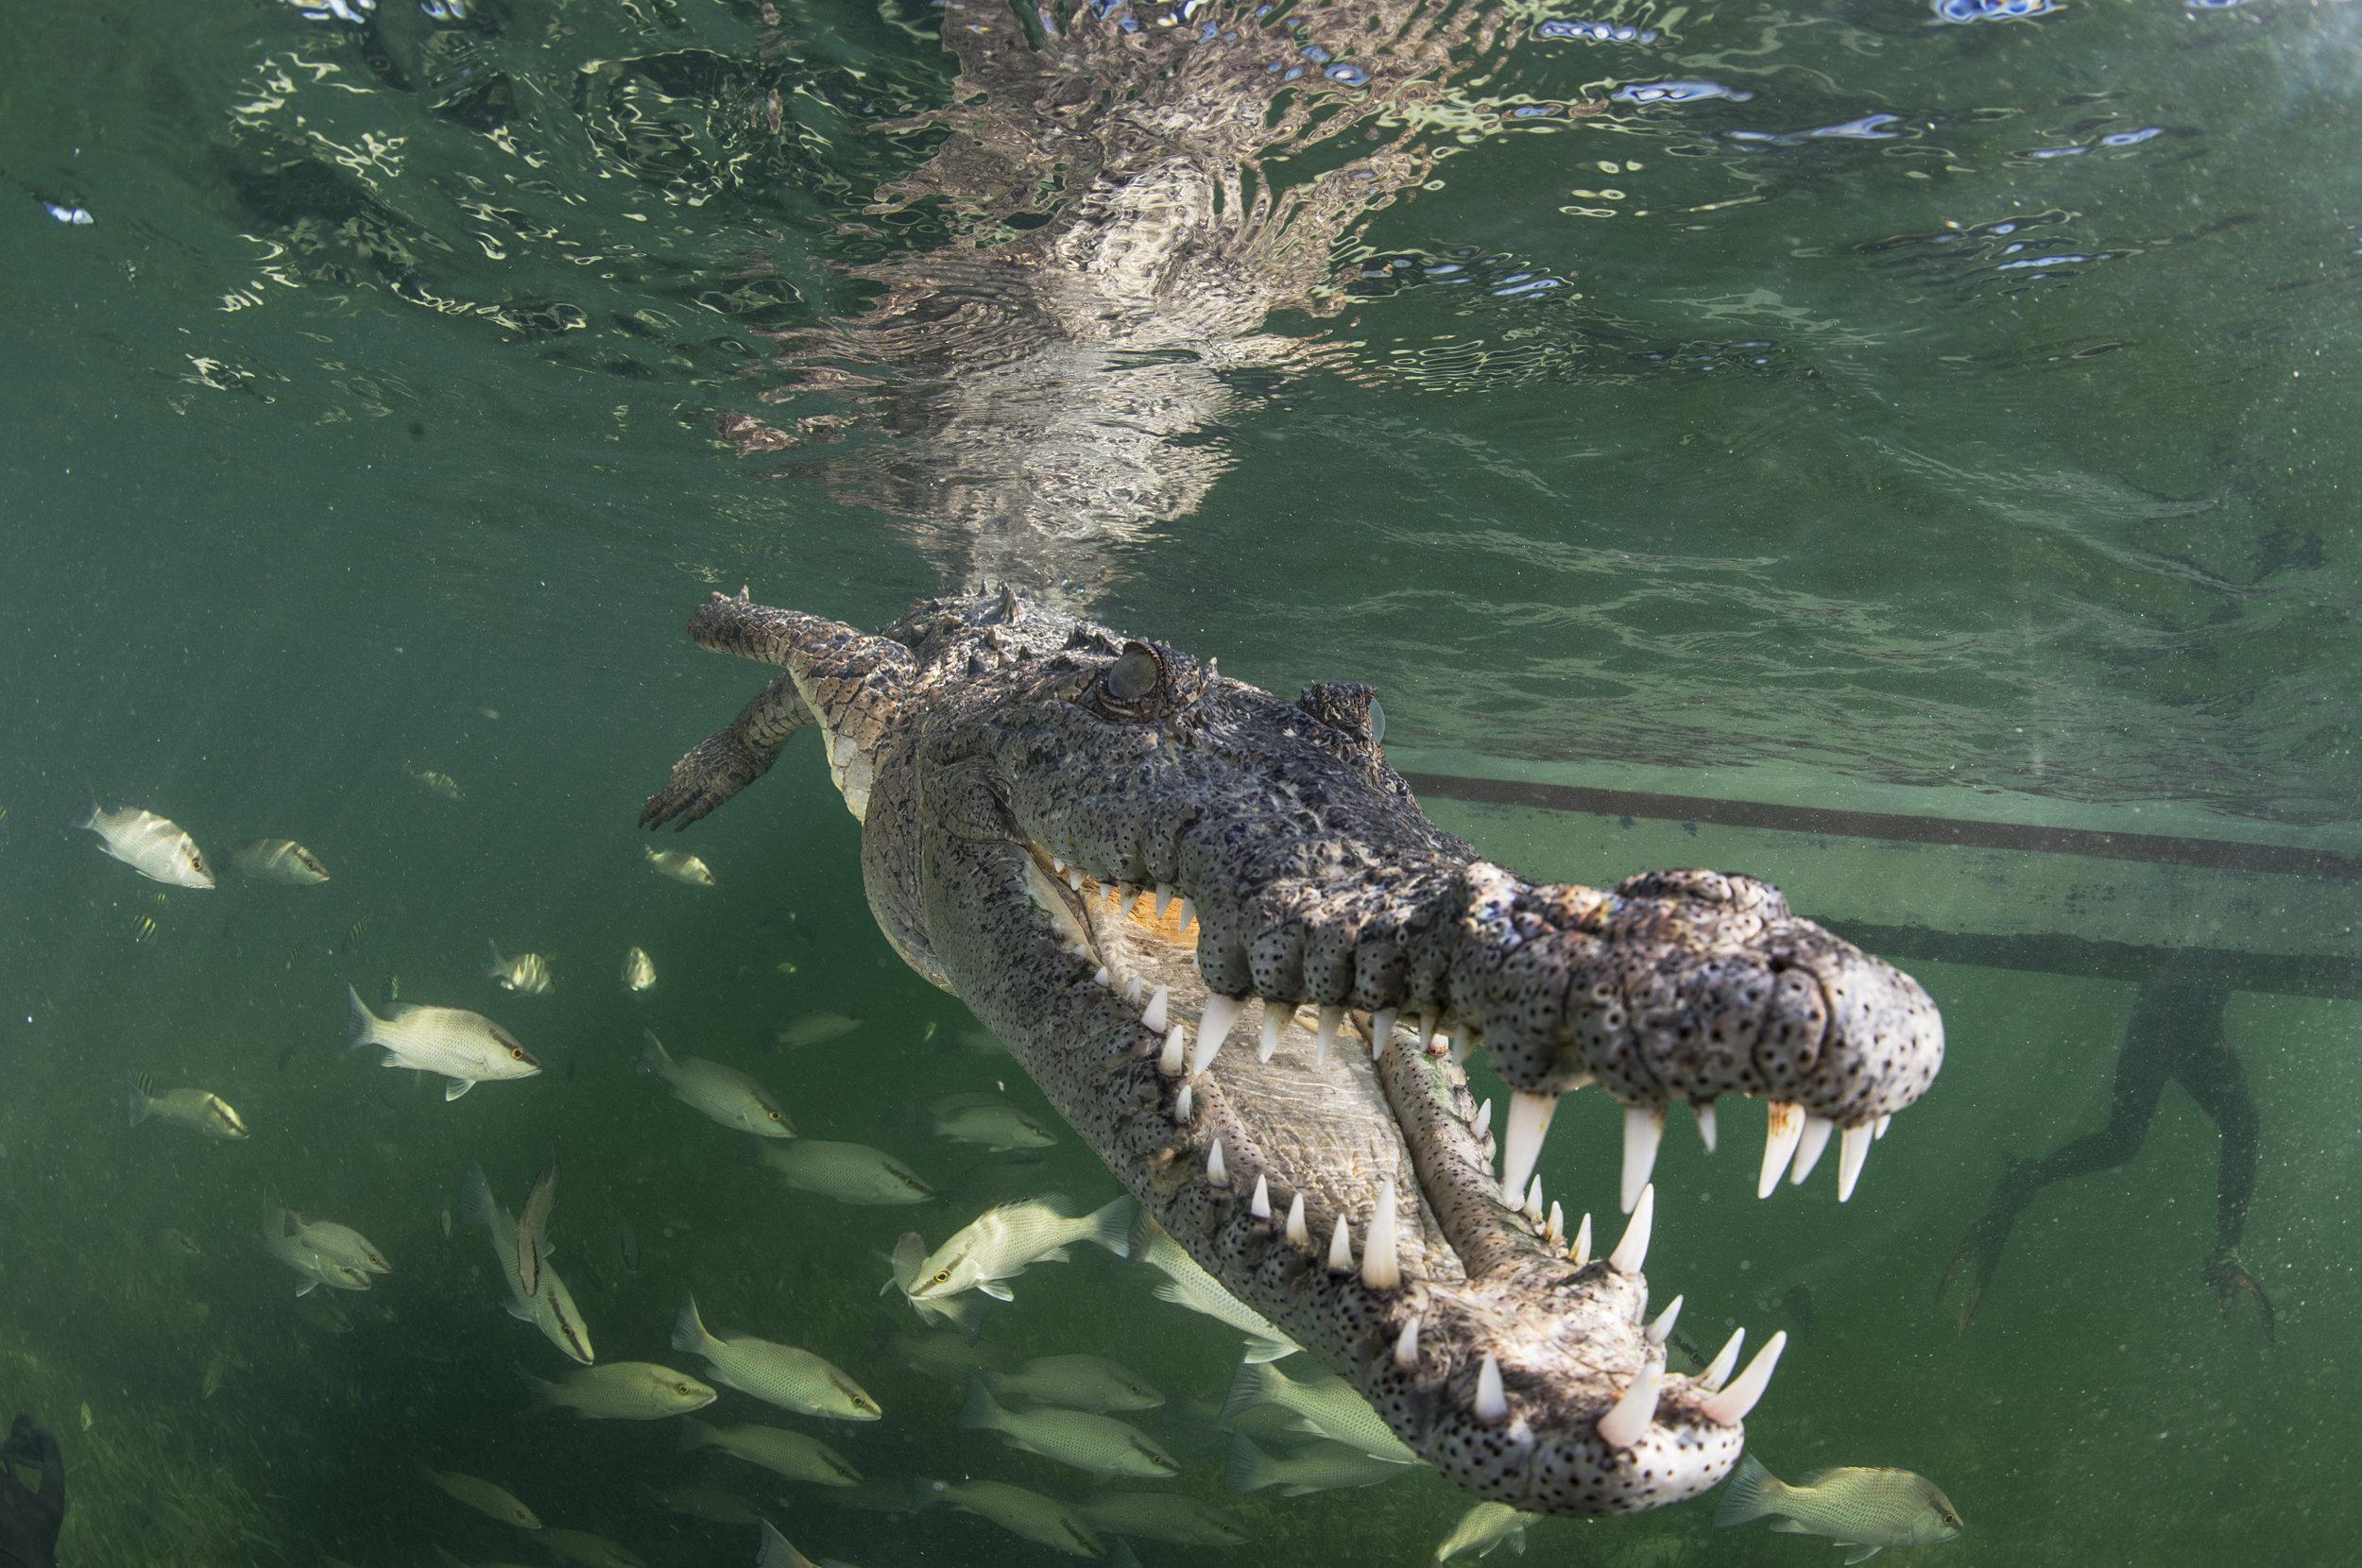 crocodile in cuba credit: jayne jenkins / coral reef image bank